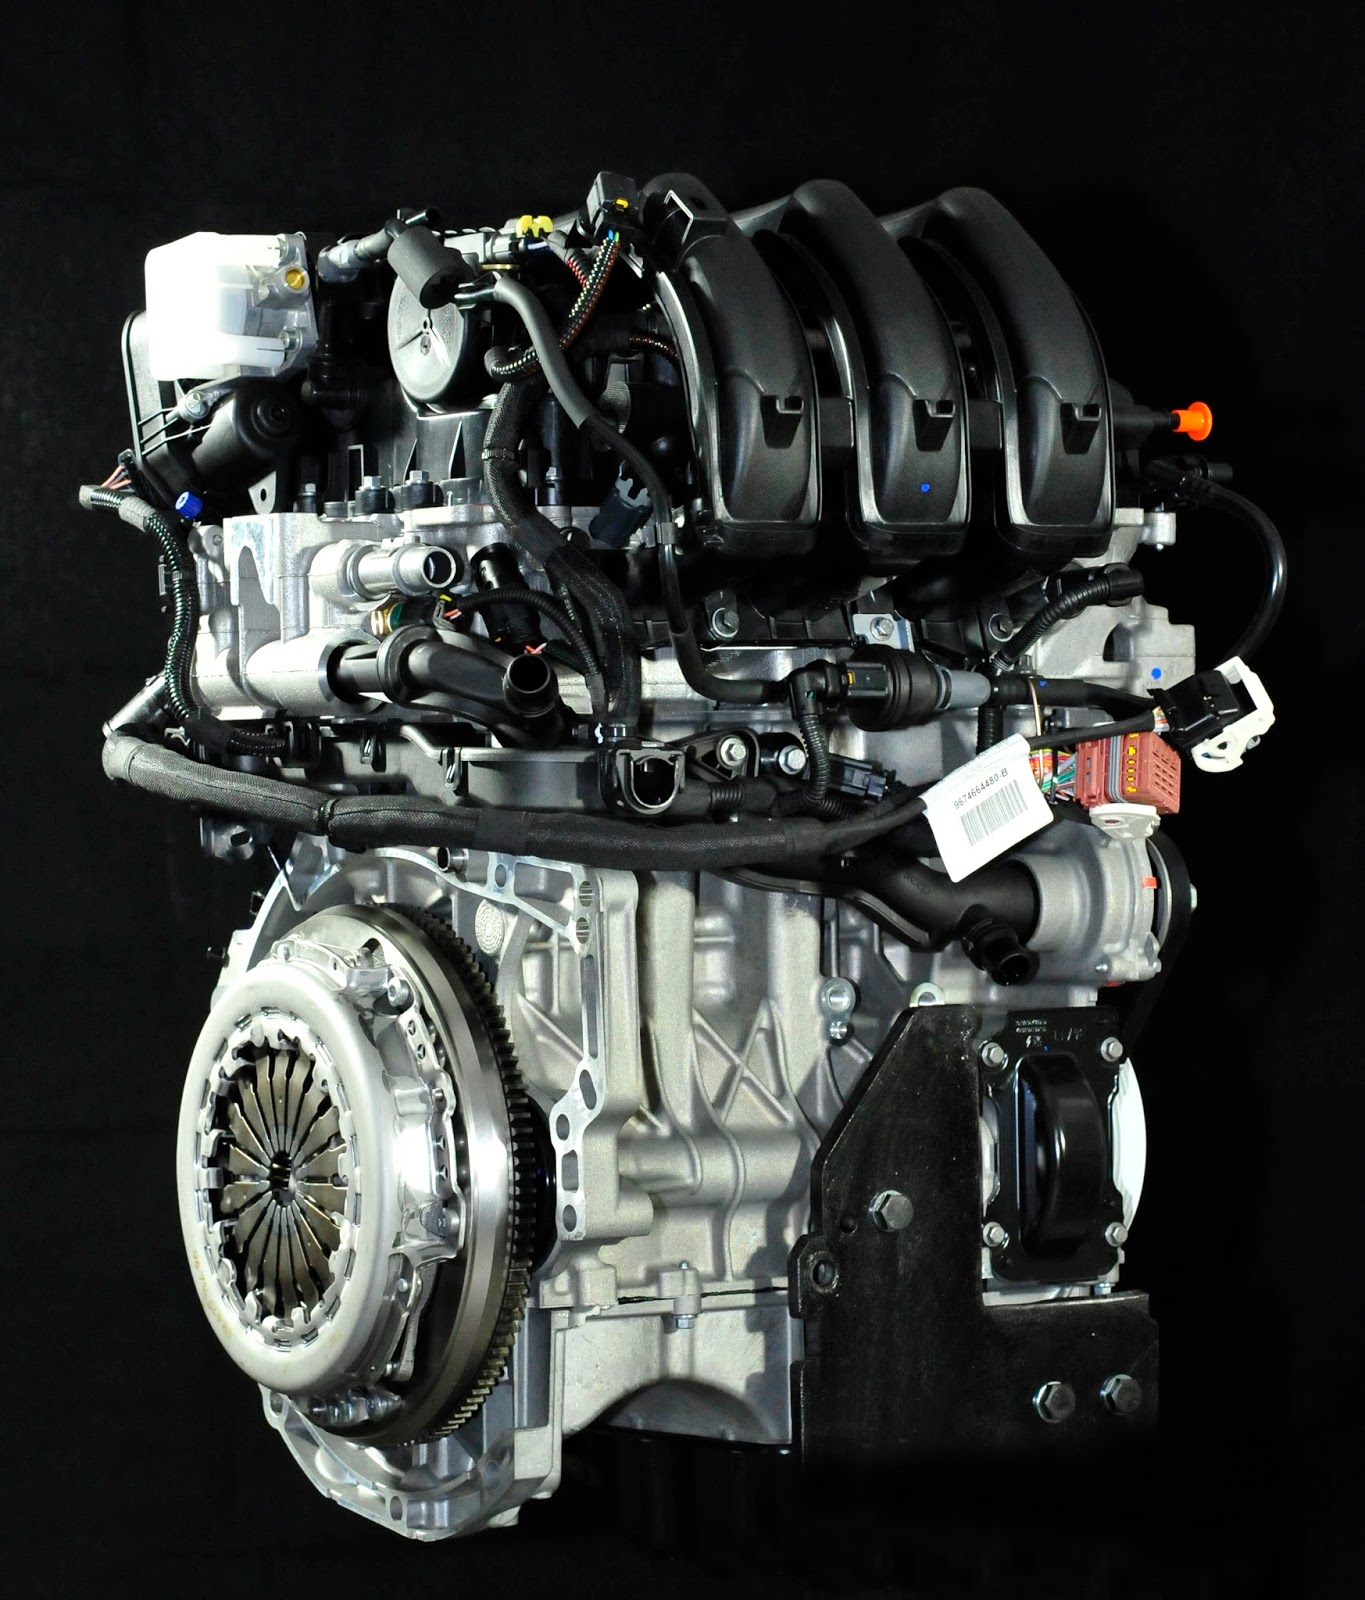 Citroen%2BEngine%2BPureTech%2B%25281%2529 H Citroen κάνει ακόμη ένα βήμα μπροστά με τη νέα γενιά κινητήρων Euro 6 citroen, Engine